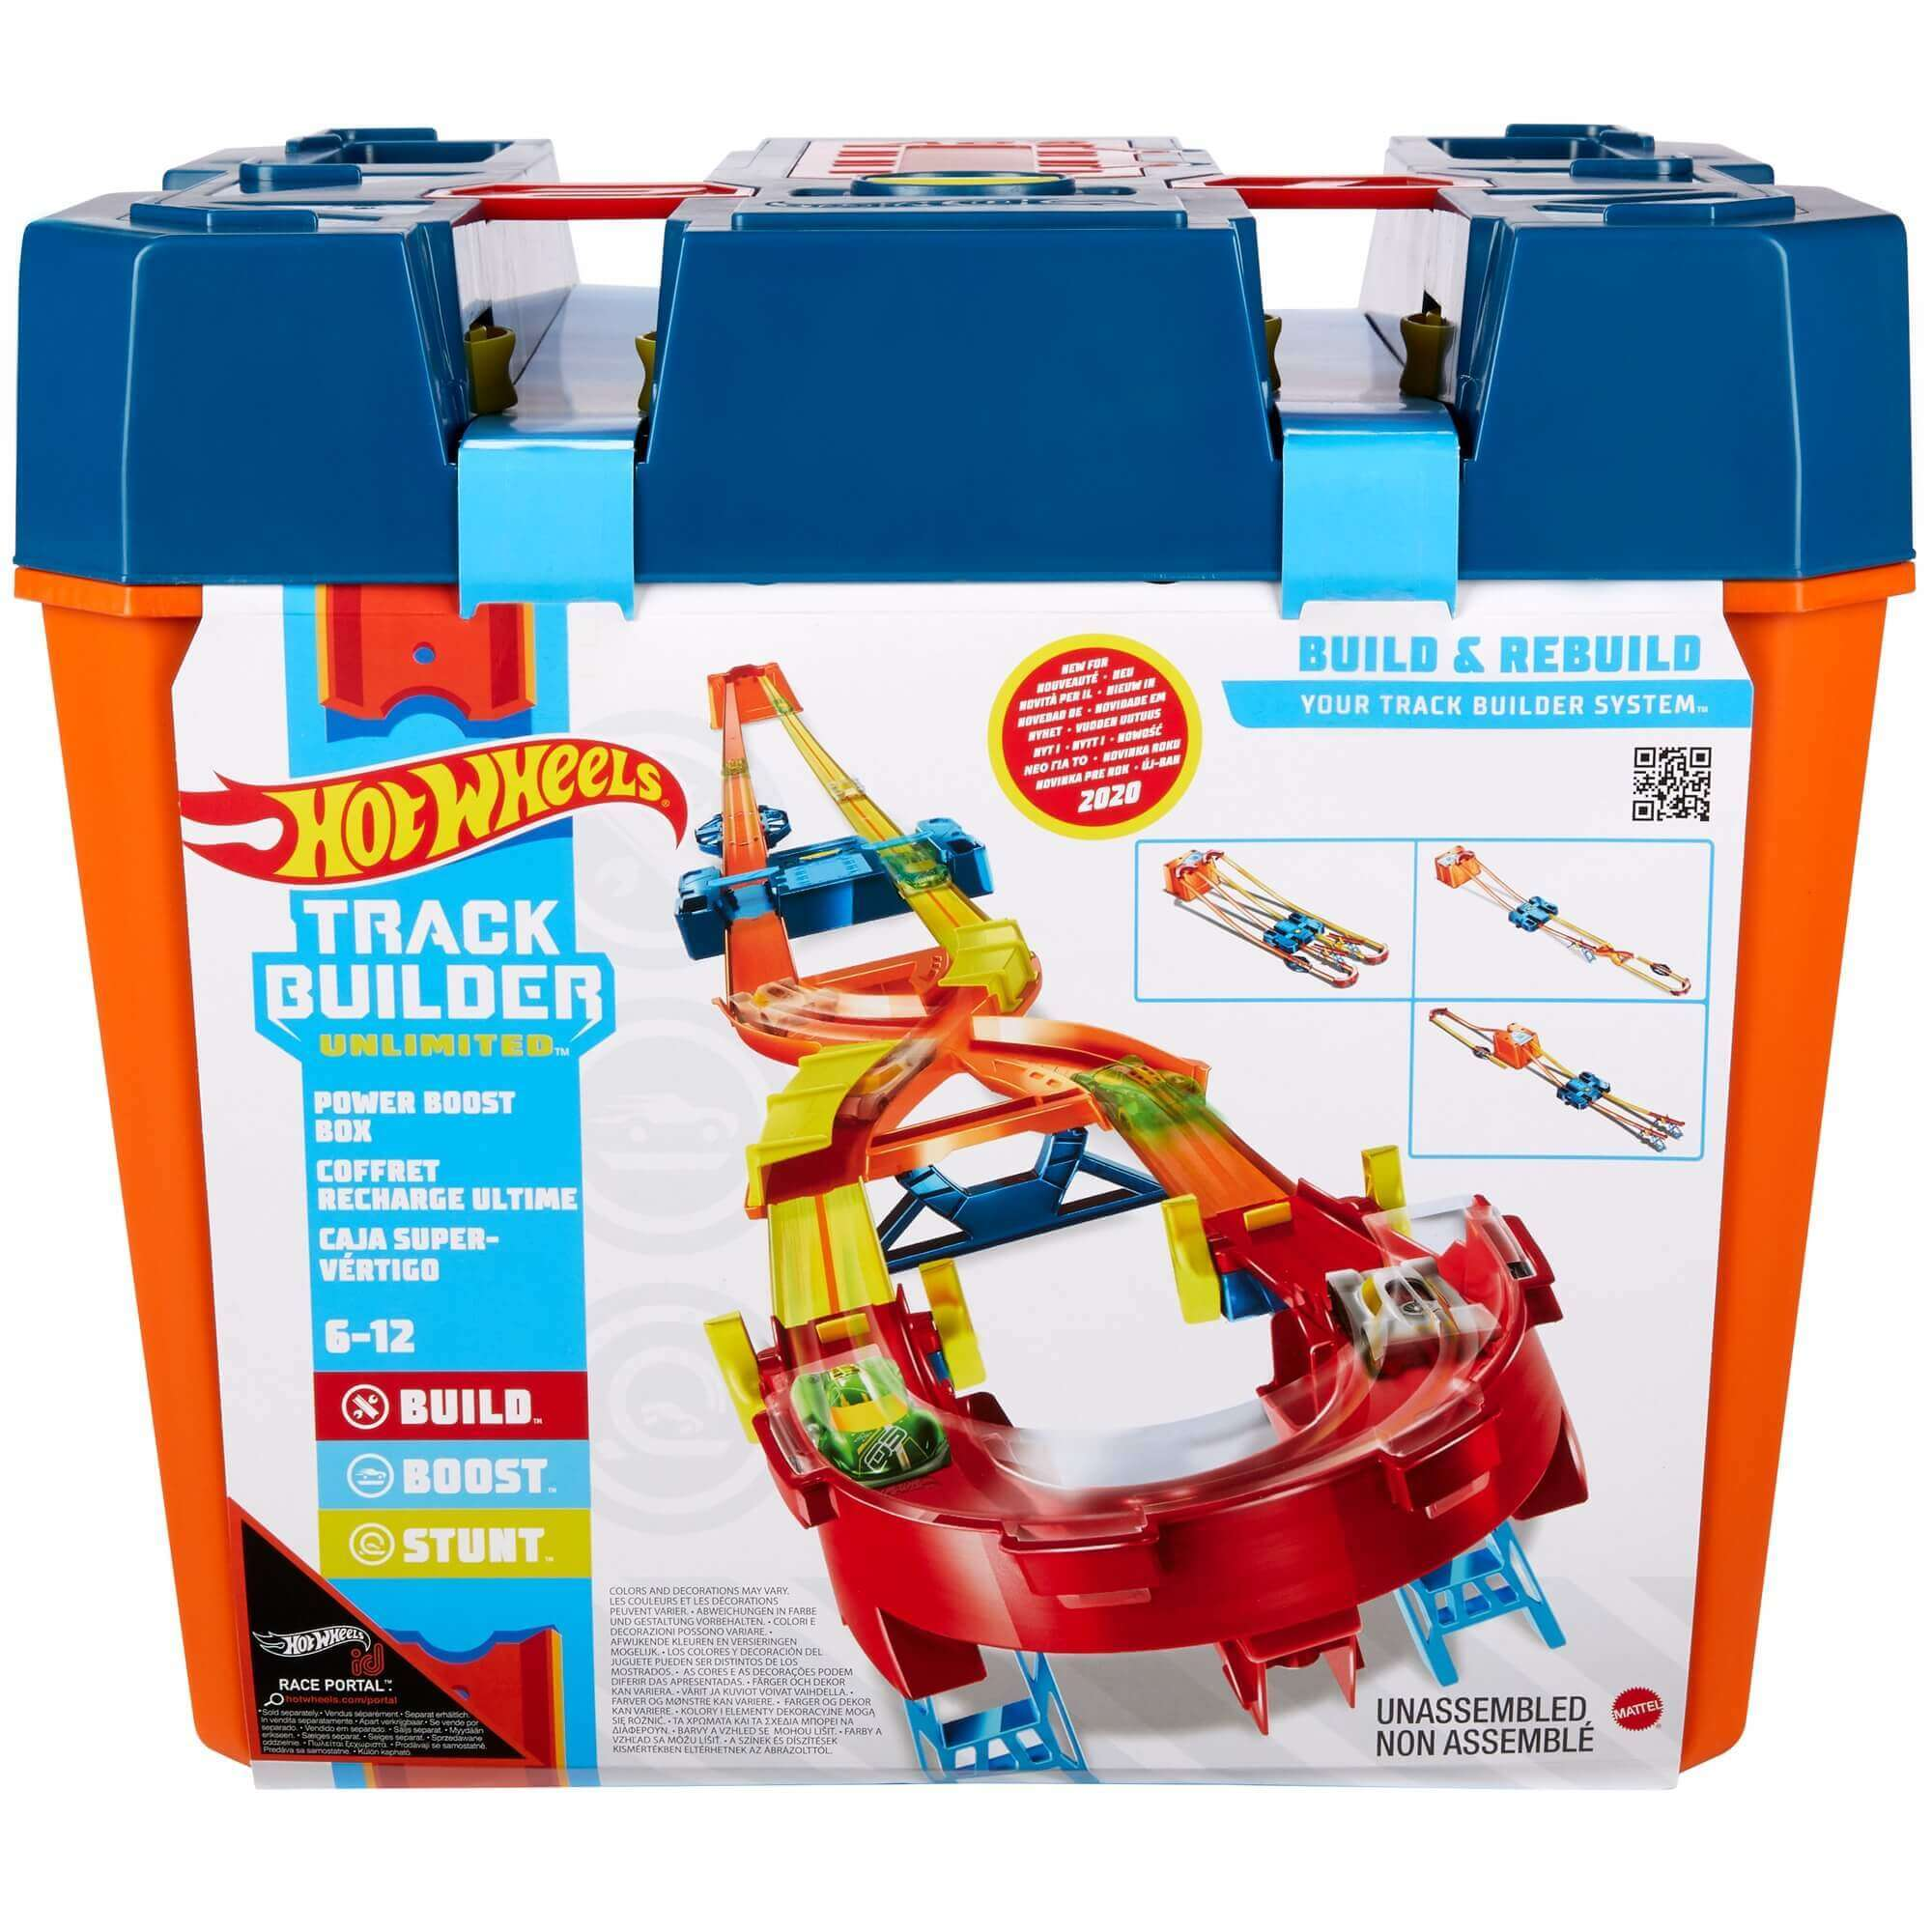 Pista Hot Wheels Track Builder Mega Caixa GNJ01 Mattel